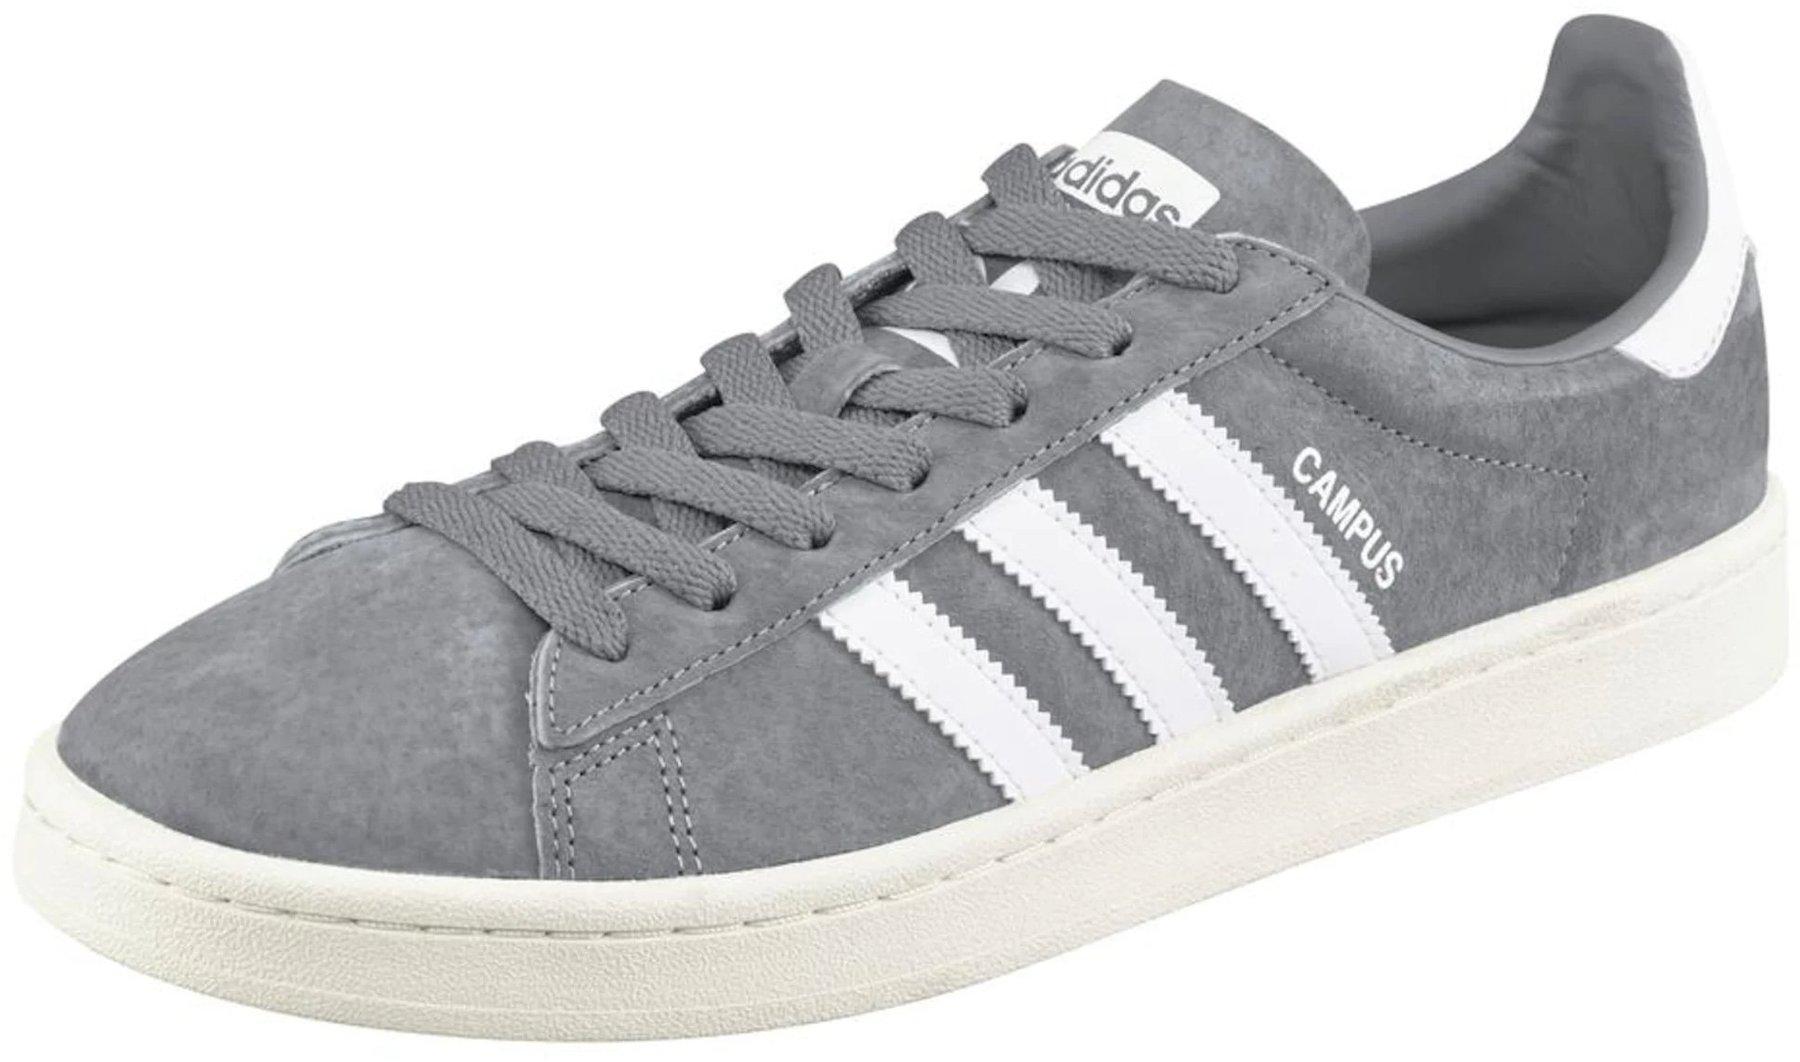 Adidas Campus grey threefootwear whitechalk white